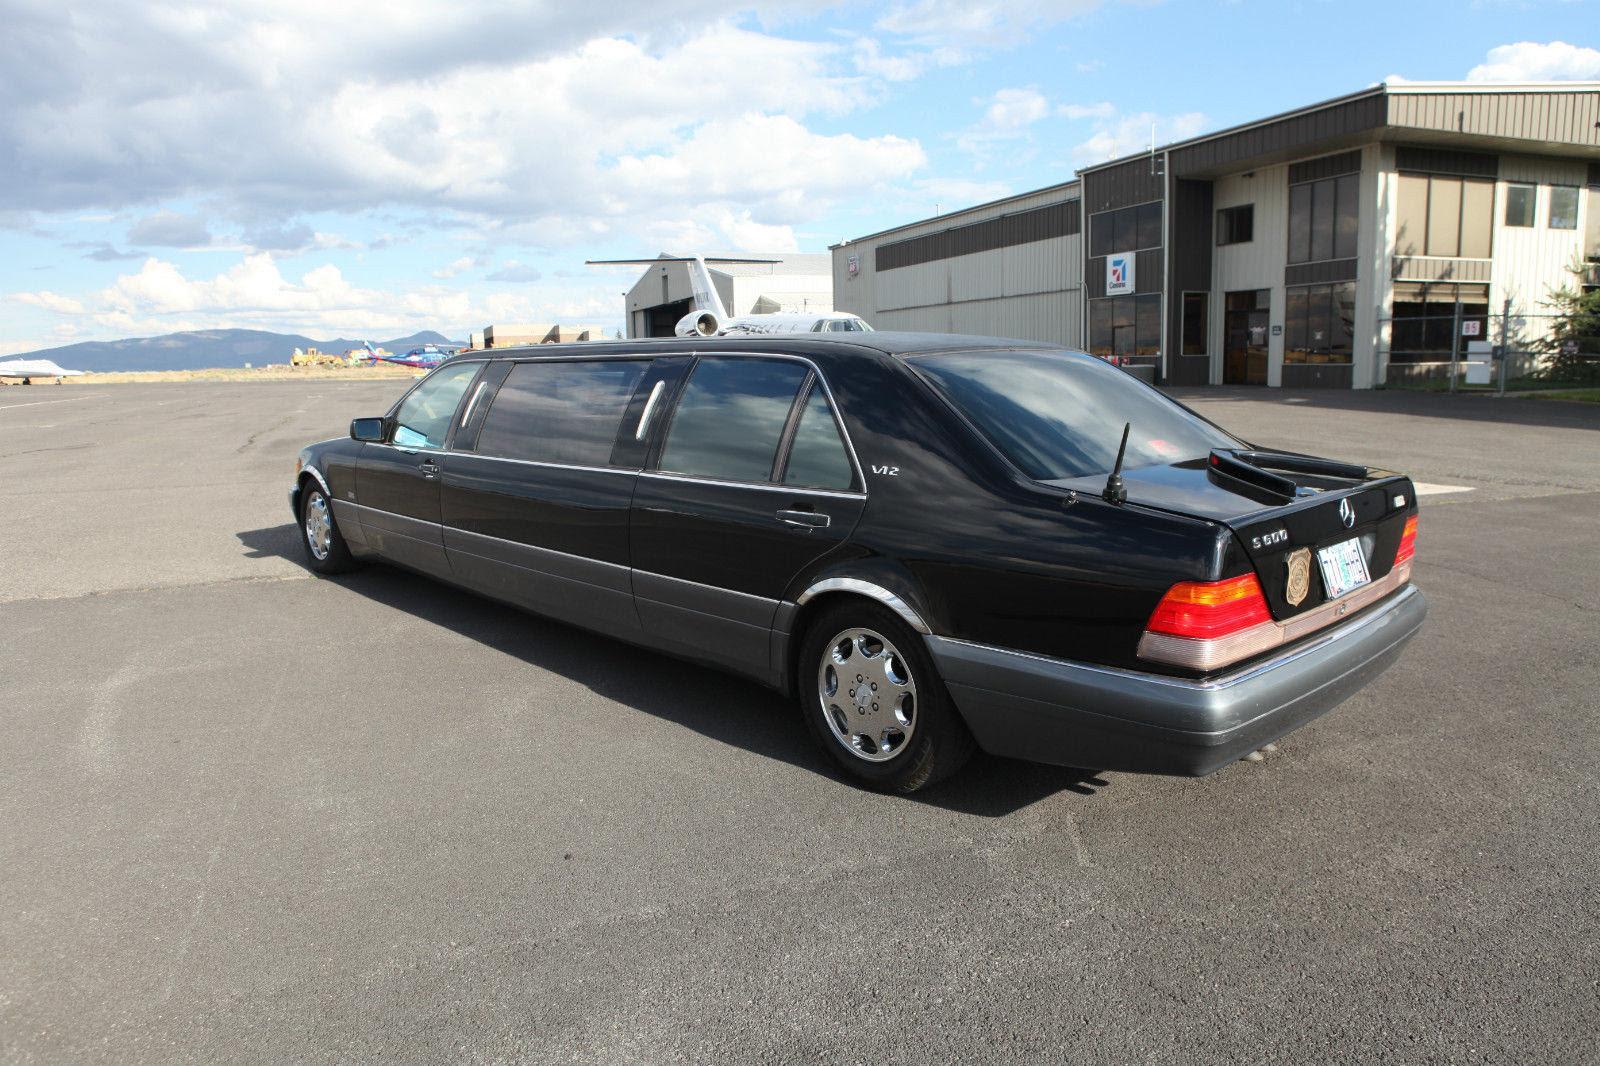 1995 Mercedes Benz S600 V12 Limousine for sale